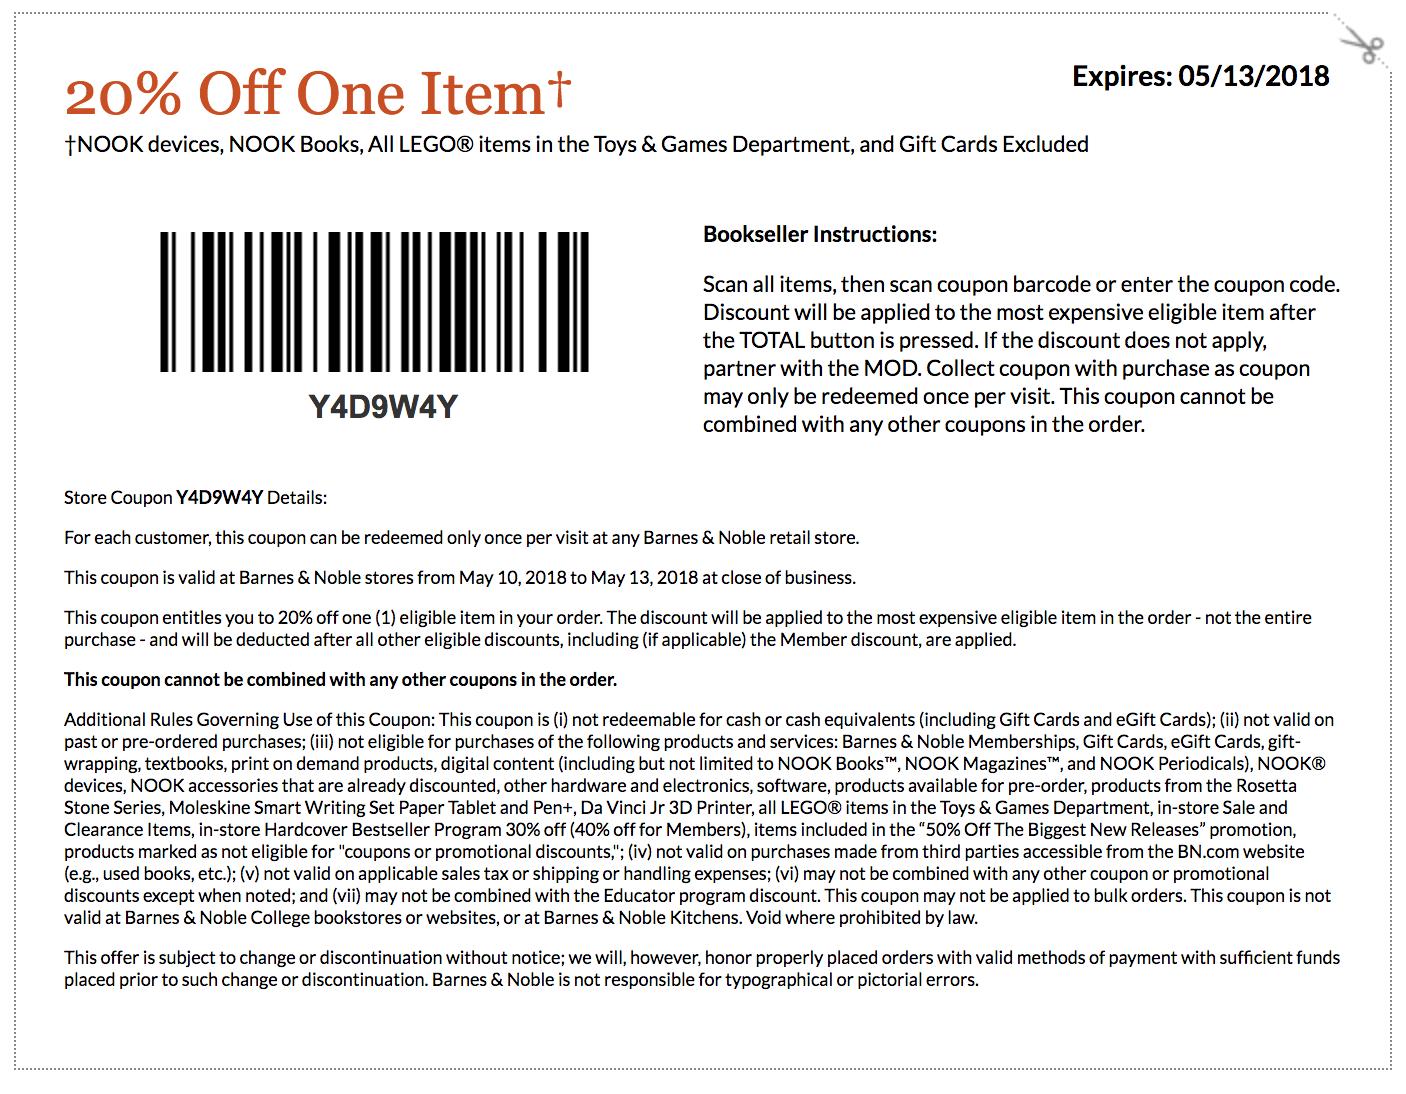 Barnes And Noble Printable Coupons 2015 Barn